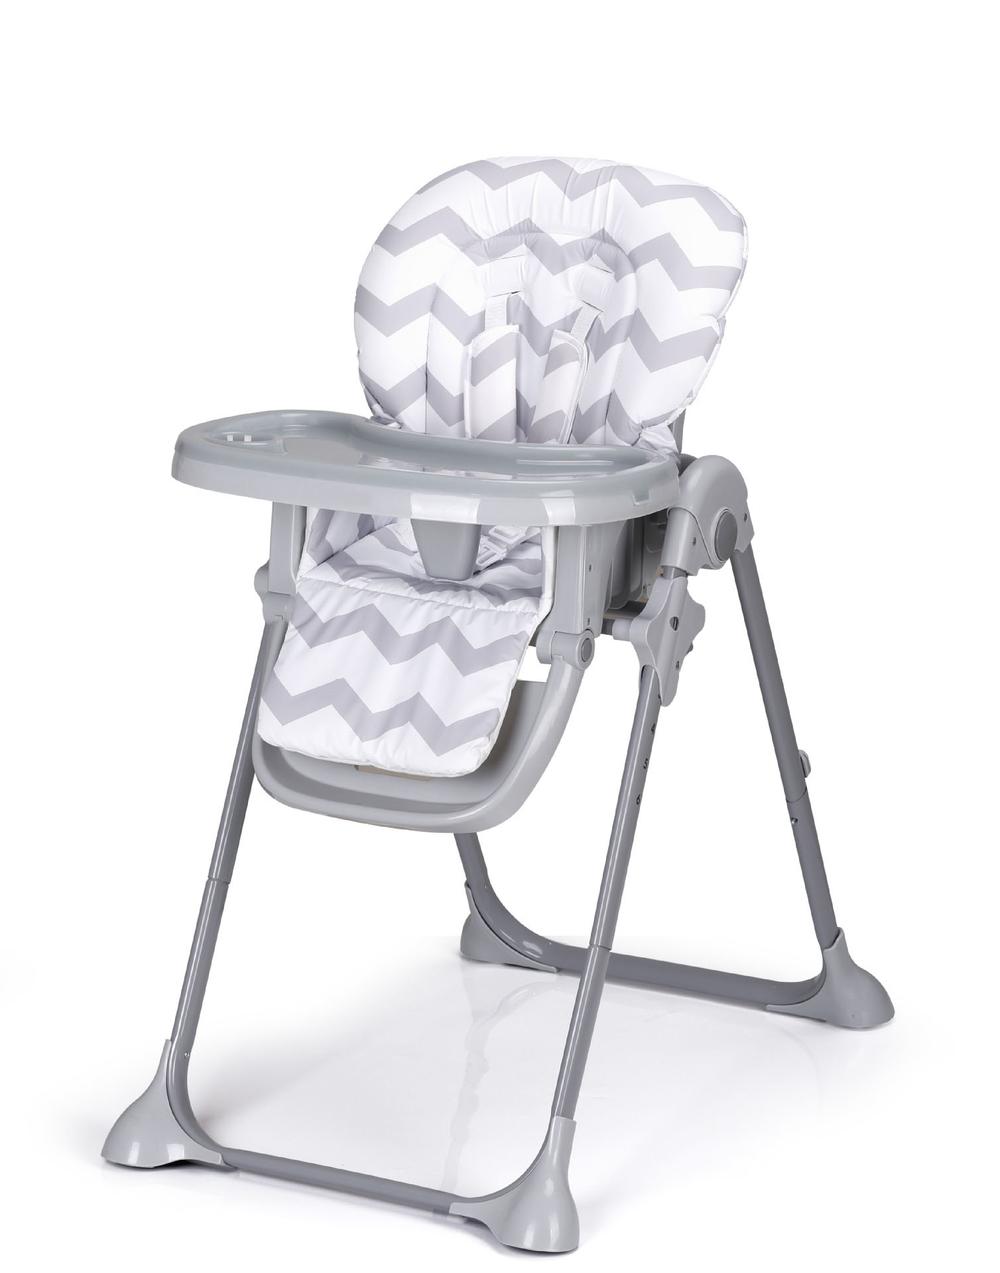 Plastic baby high chair baby feeding chair HR-B-002S